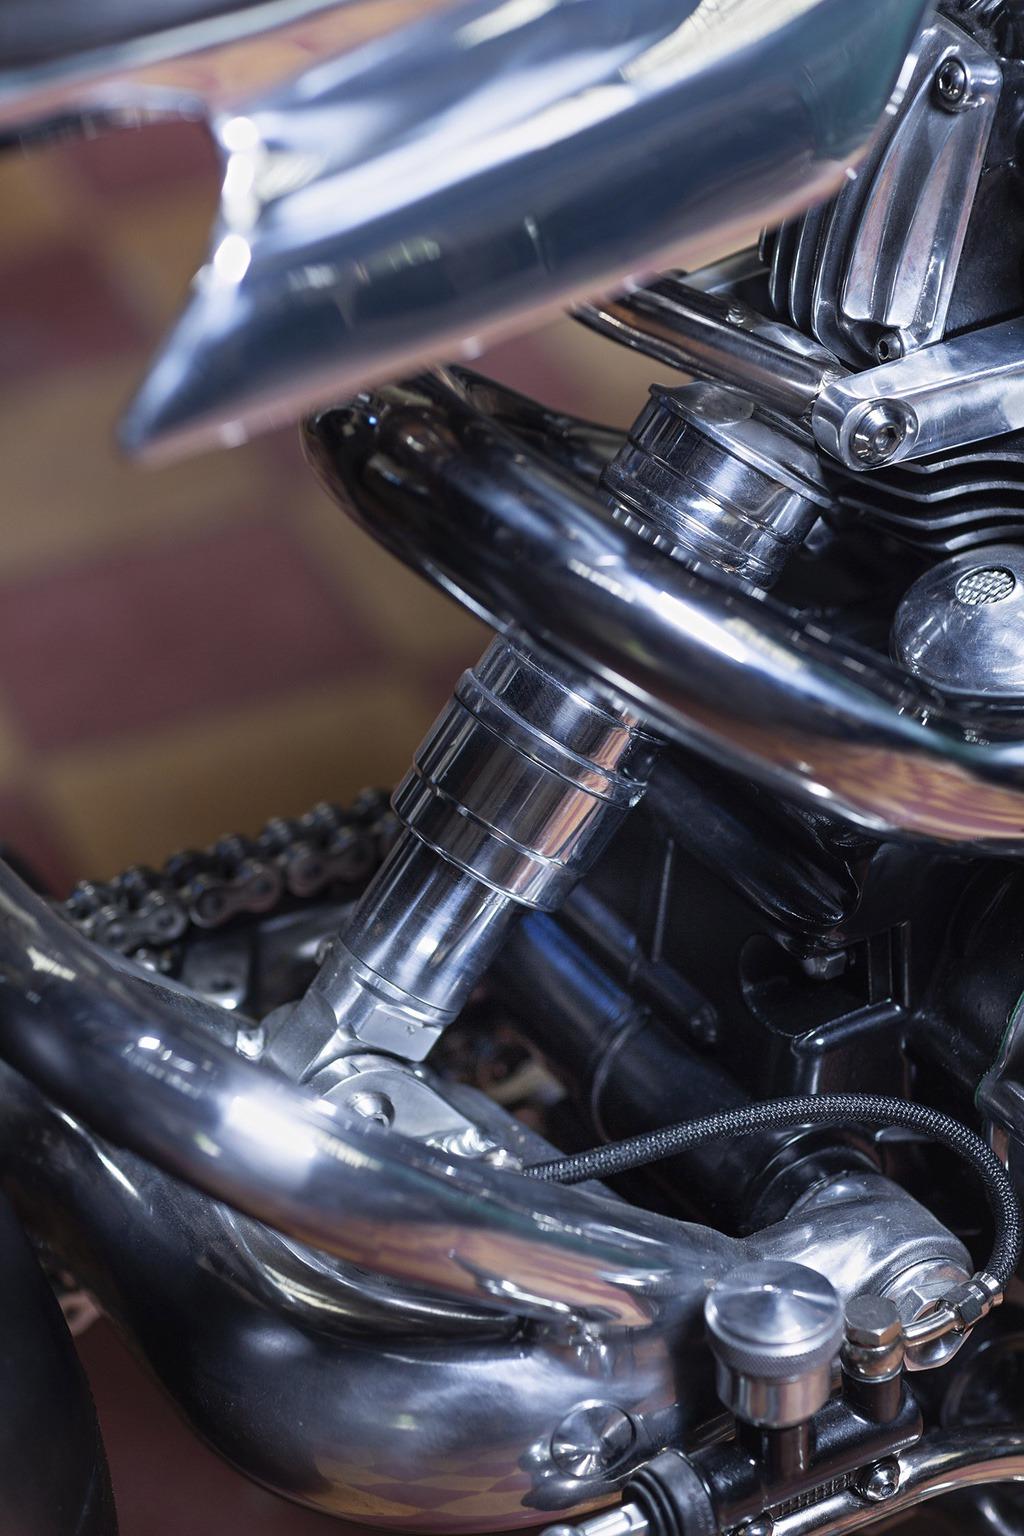 Ducati 750ss ot cevennes retro motors 12🔴 Мотошедевр Ducati 750SS от Cevennes Retro Motors